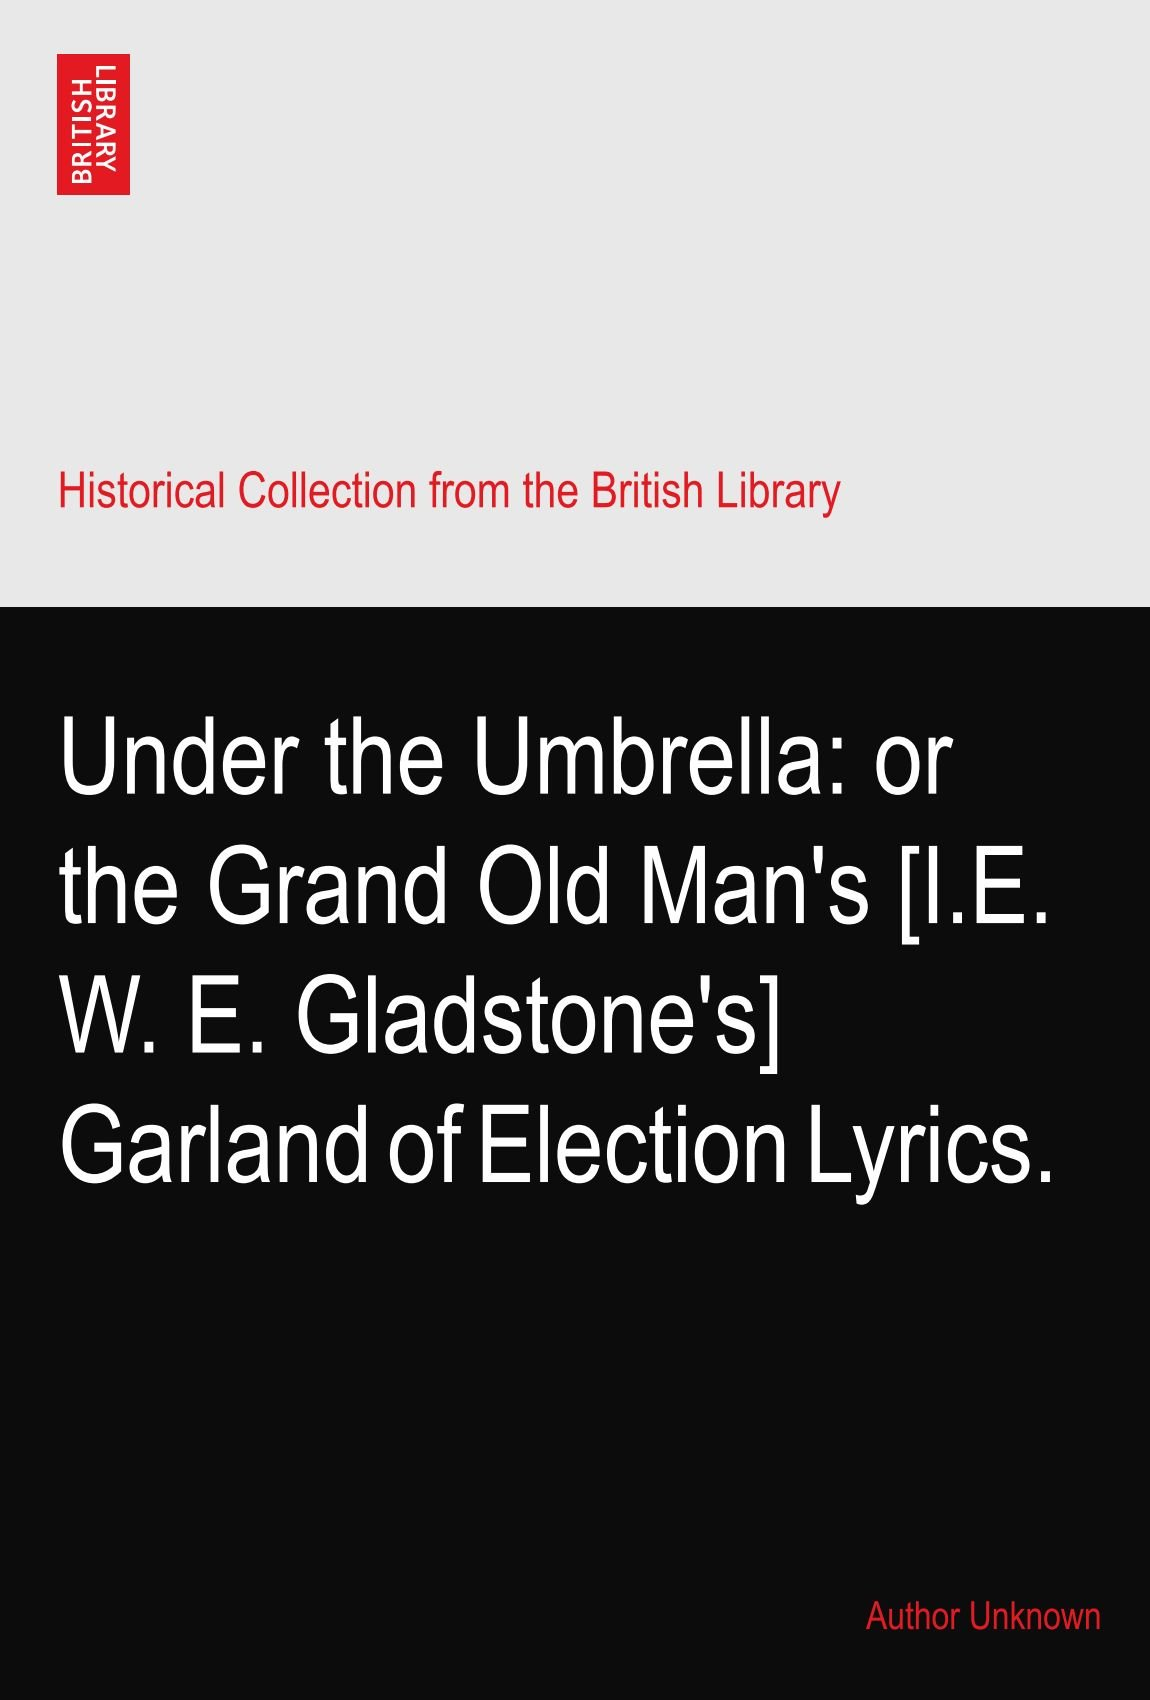 Under the Umbrella: or the Grand Old Man's [I.E. W. E. Gladstone's] Garland of Election Lyrics. ebook